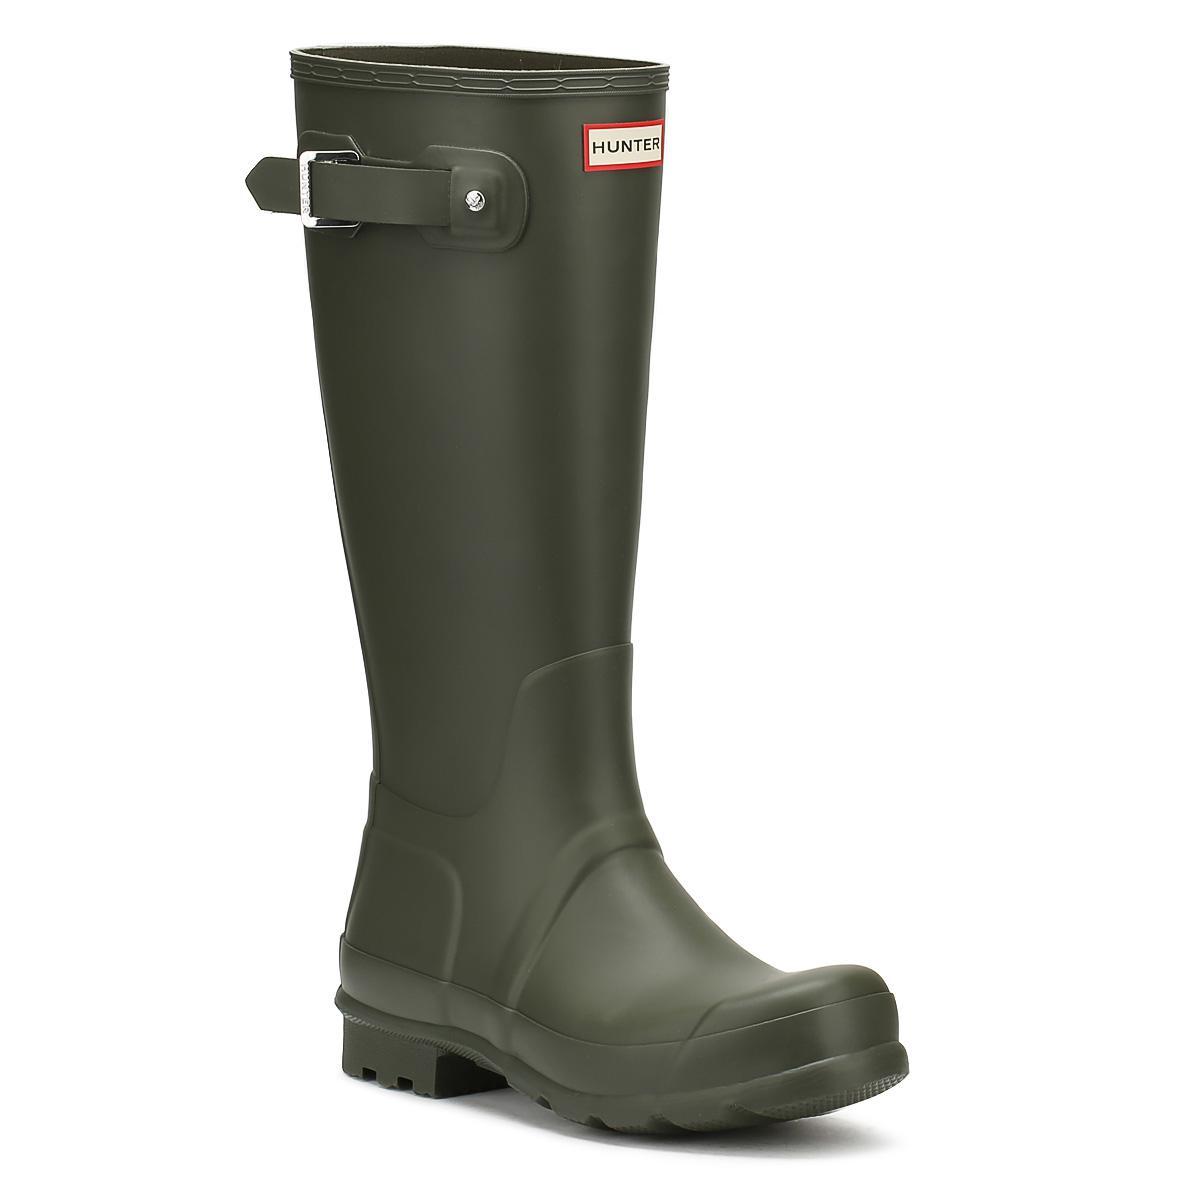 HUNTER. Original Mens Dark Olive Green Tall Wellington Boots